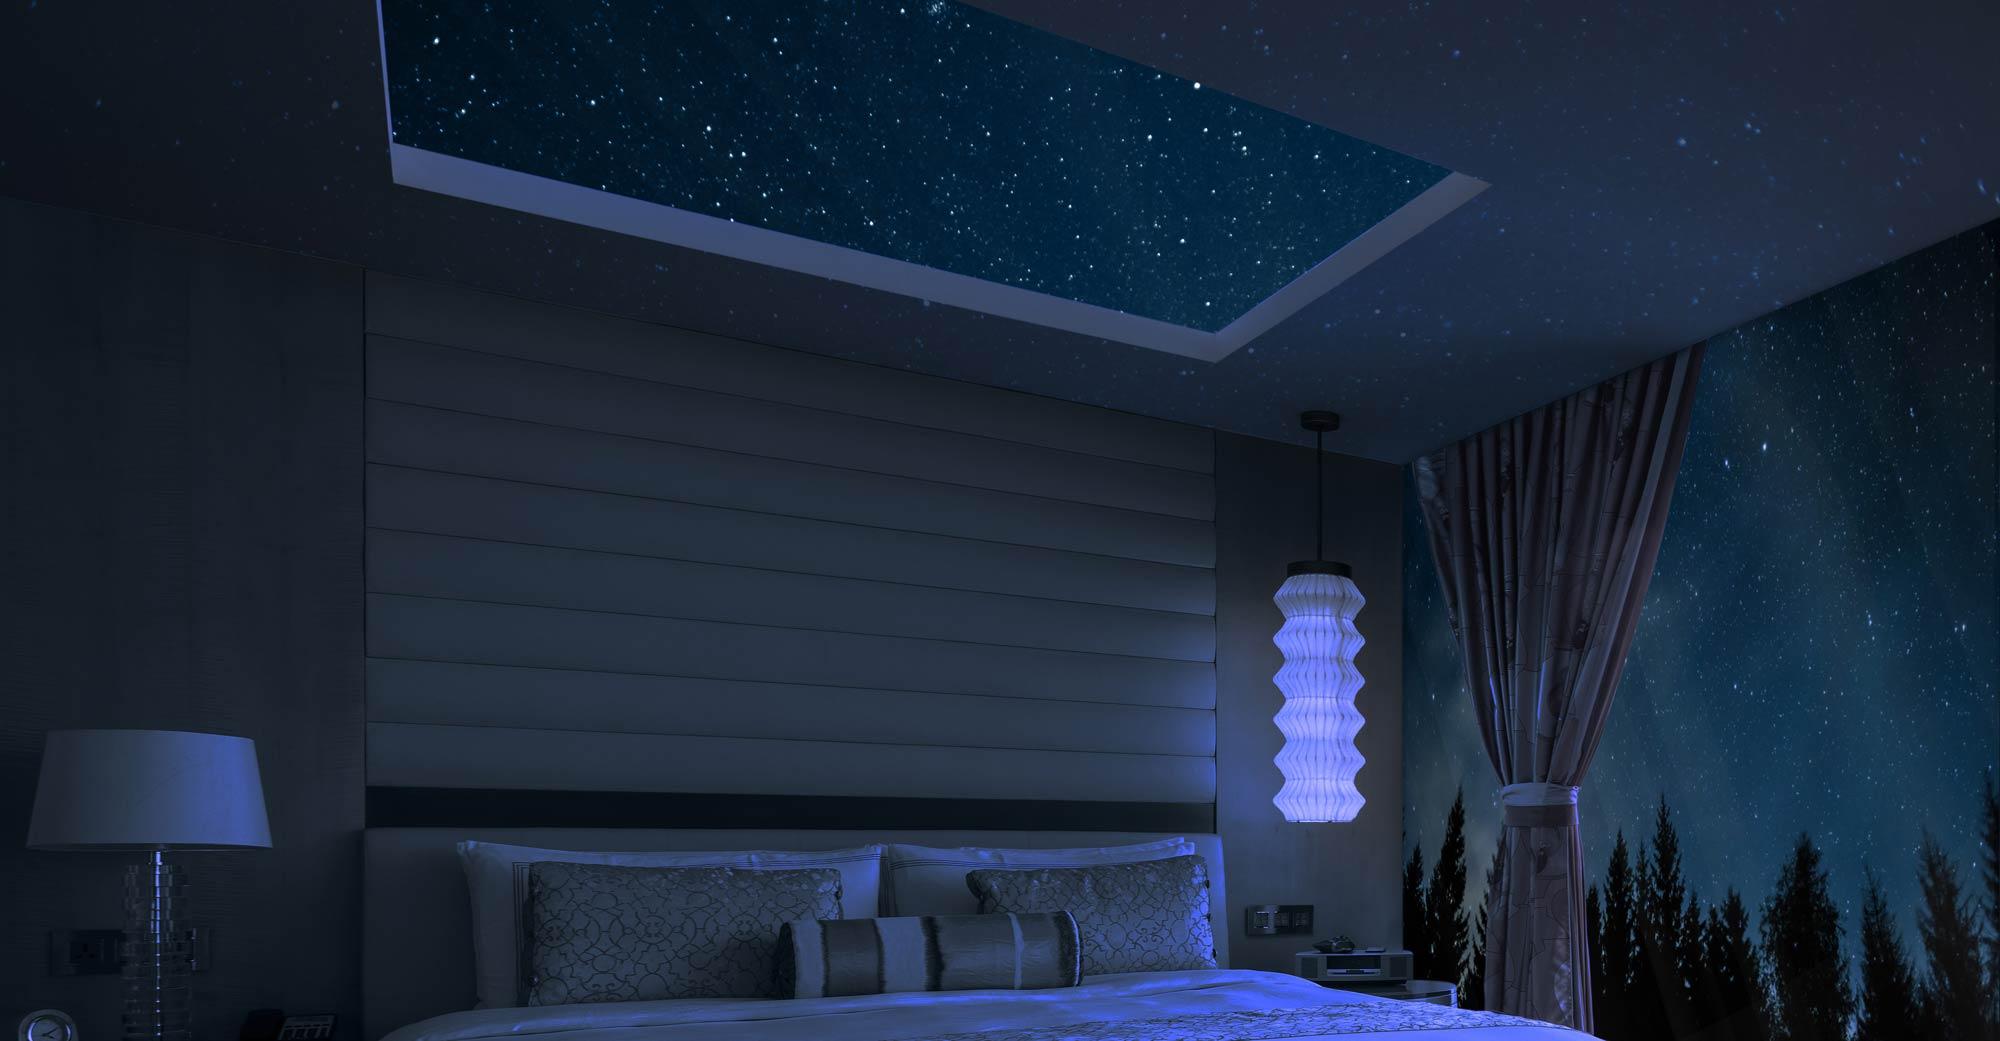 Smart Alternative Reality Area by night